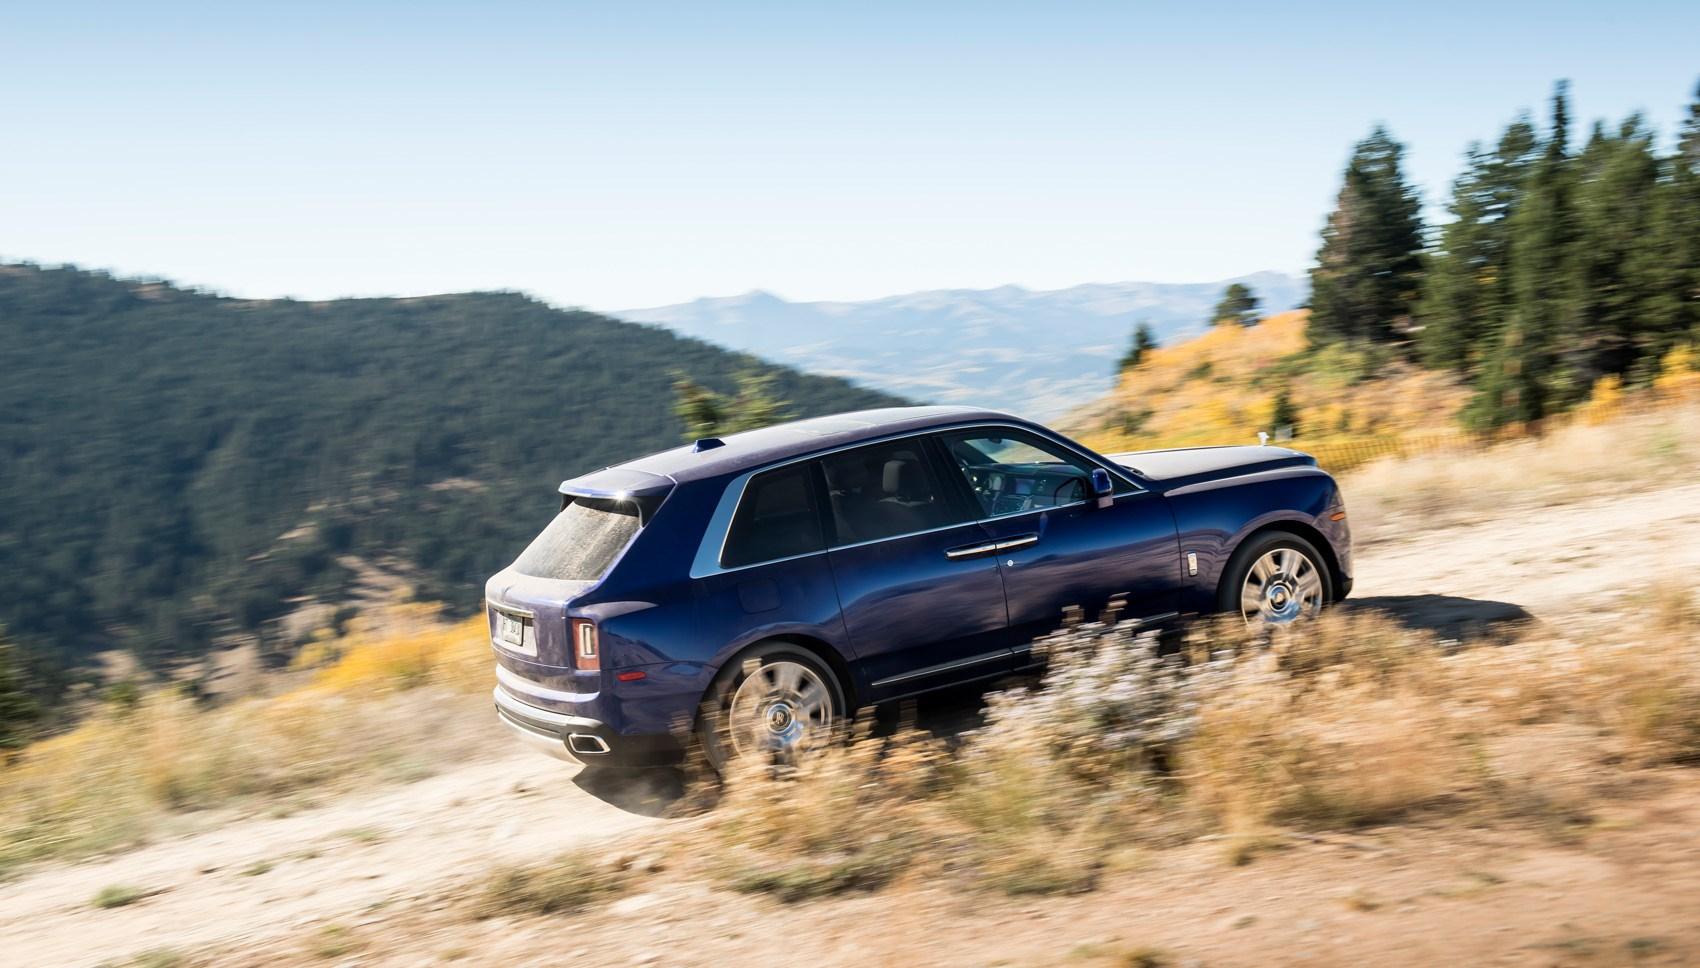 Rolls-Royce Cullinan off-road